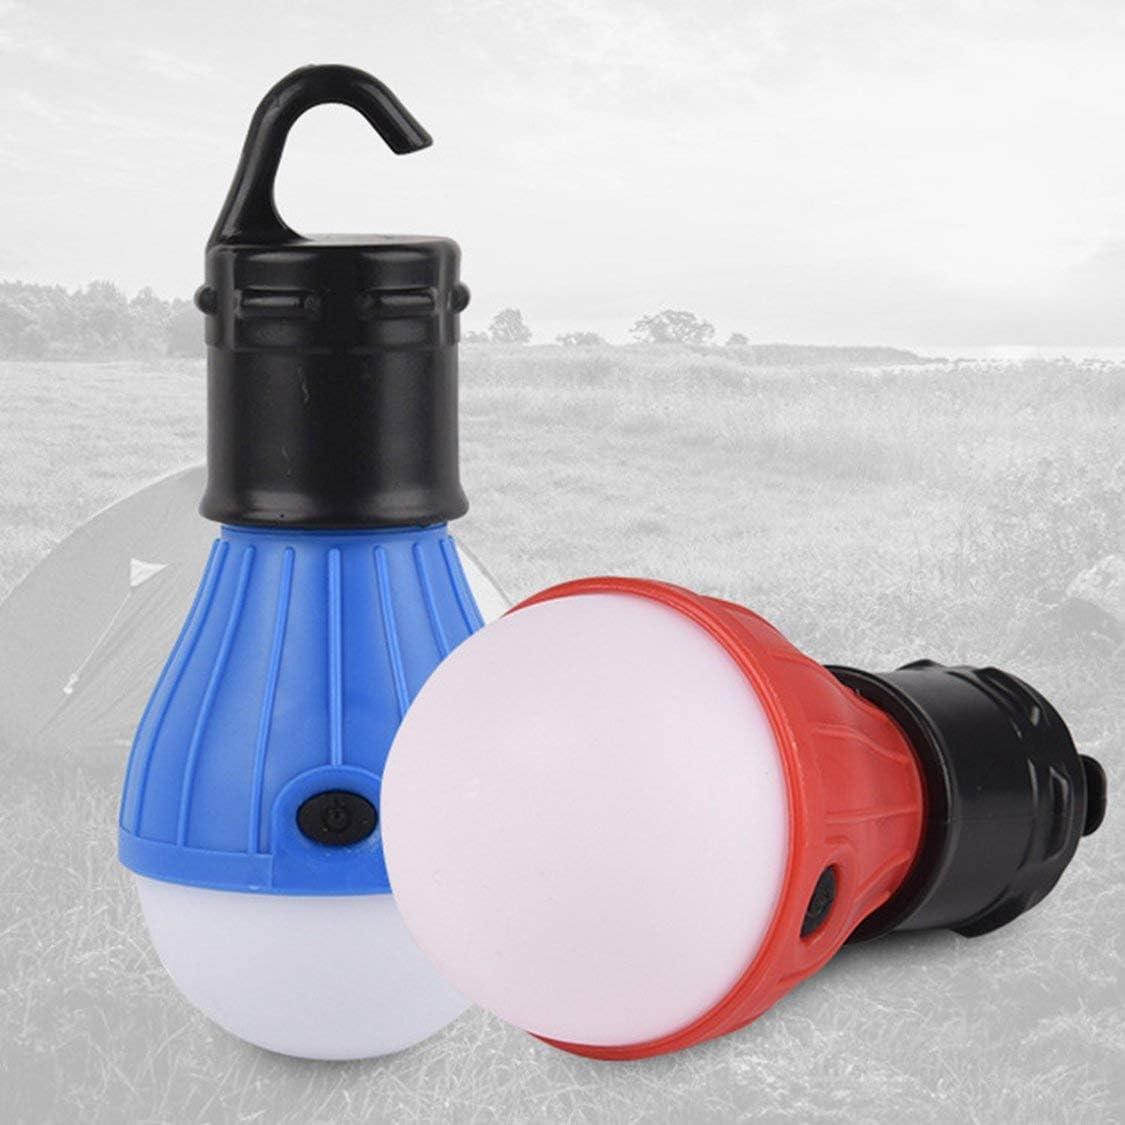 Dynamovolition Mini Linterna port/átil Tienda luz LED Bombilla Impermeable Gancho Colgante Linterna para Acampar